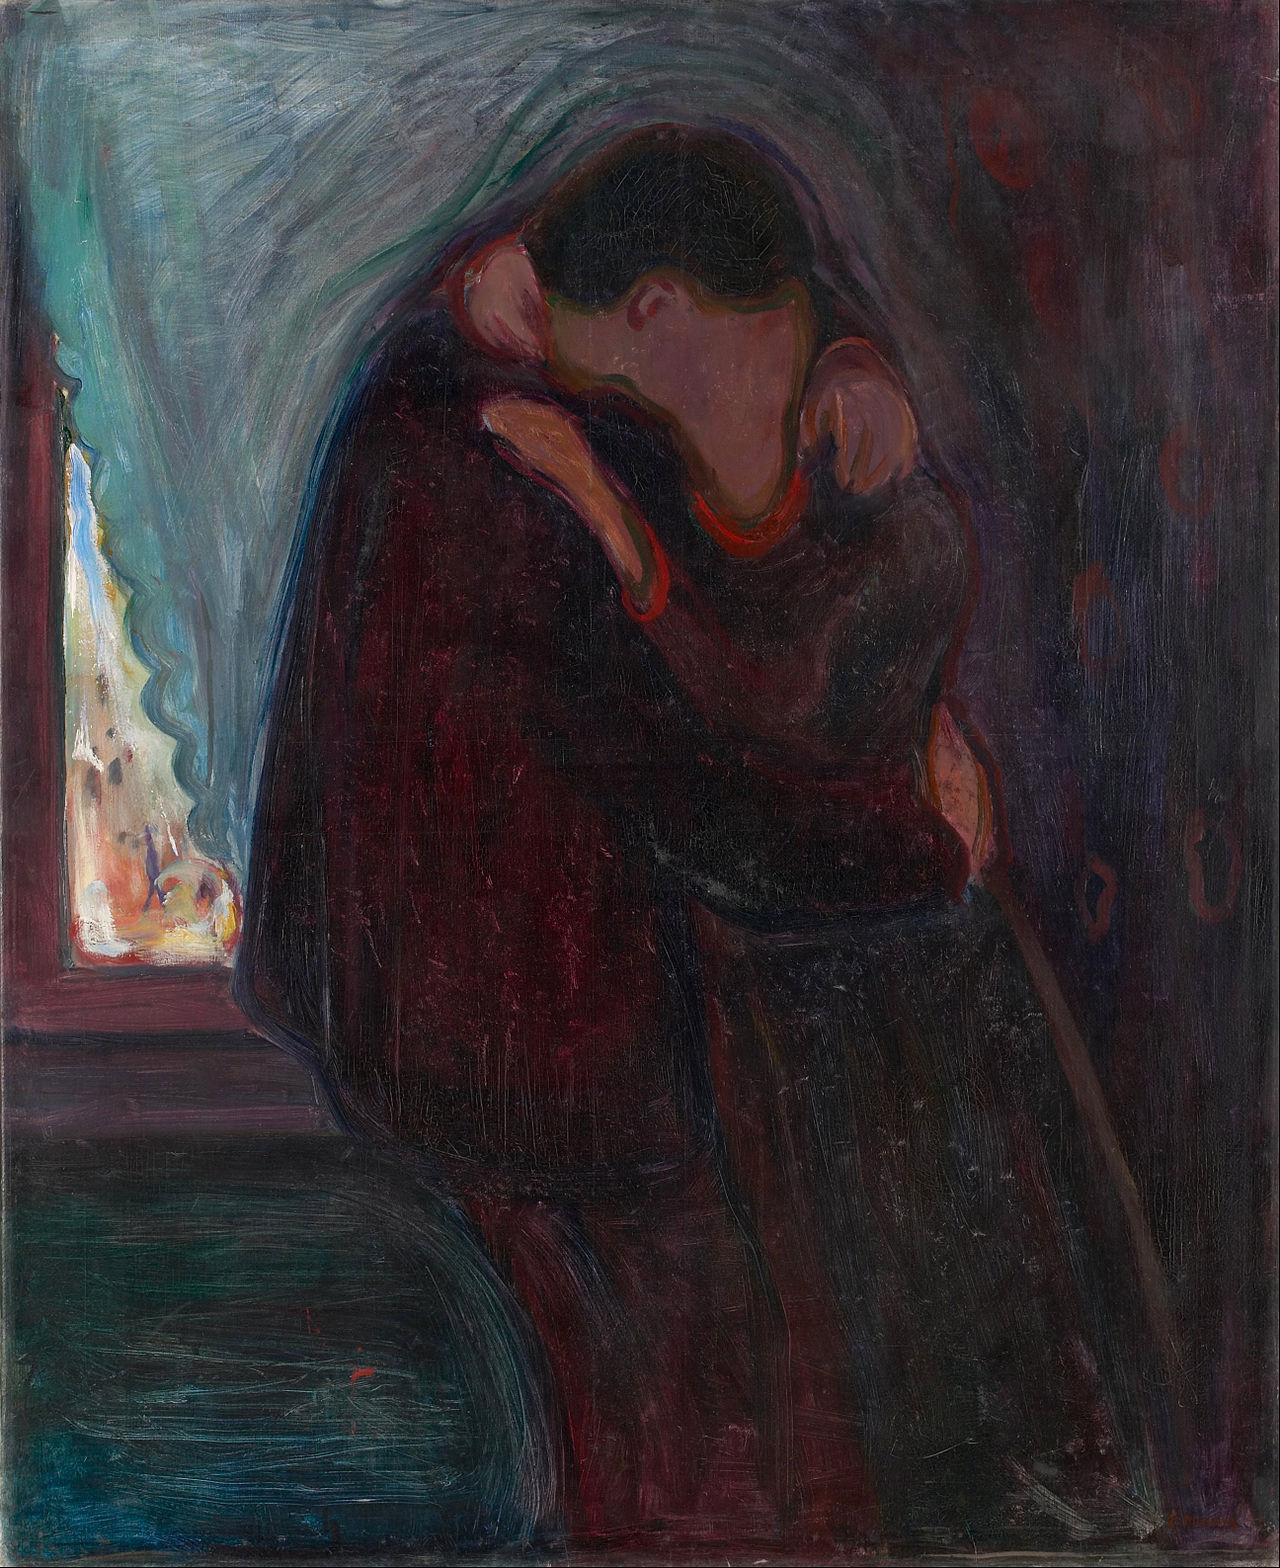 Edvard Munch,  The Kiss , 1897, oil on canvas,99 ×81 cm, © Munch-museet/Munch -Ellingsen Gruppen/Bono